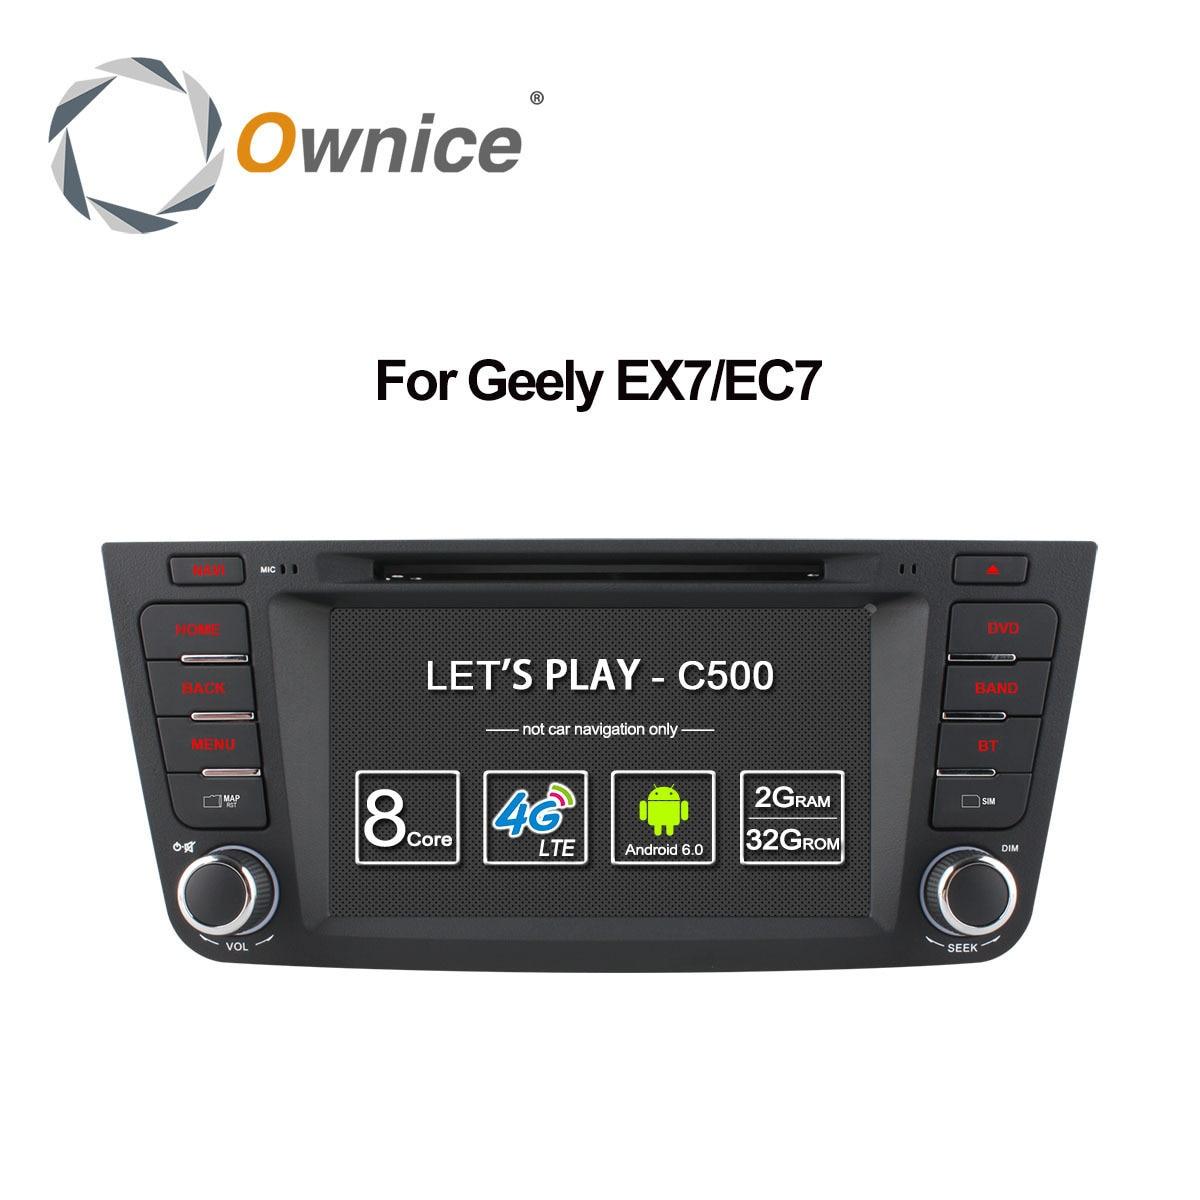 Ownice C500 Octa 8 ядра dvd плеер для Geely Emgrand GX7 Ex7 X7 Android 6.0 GPS 2 din 2 ГБ Оперативная память 32 ГБ Встроенная память поддержка 4 г dab